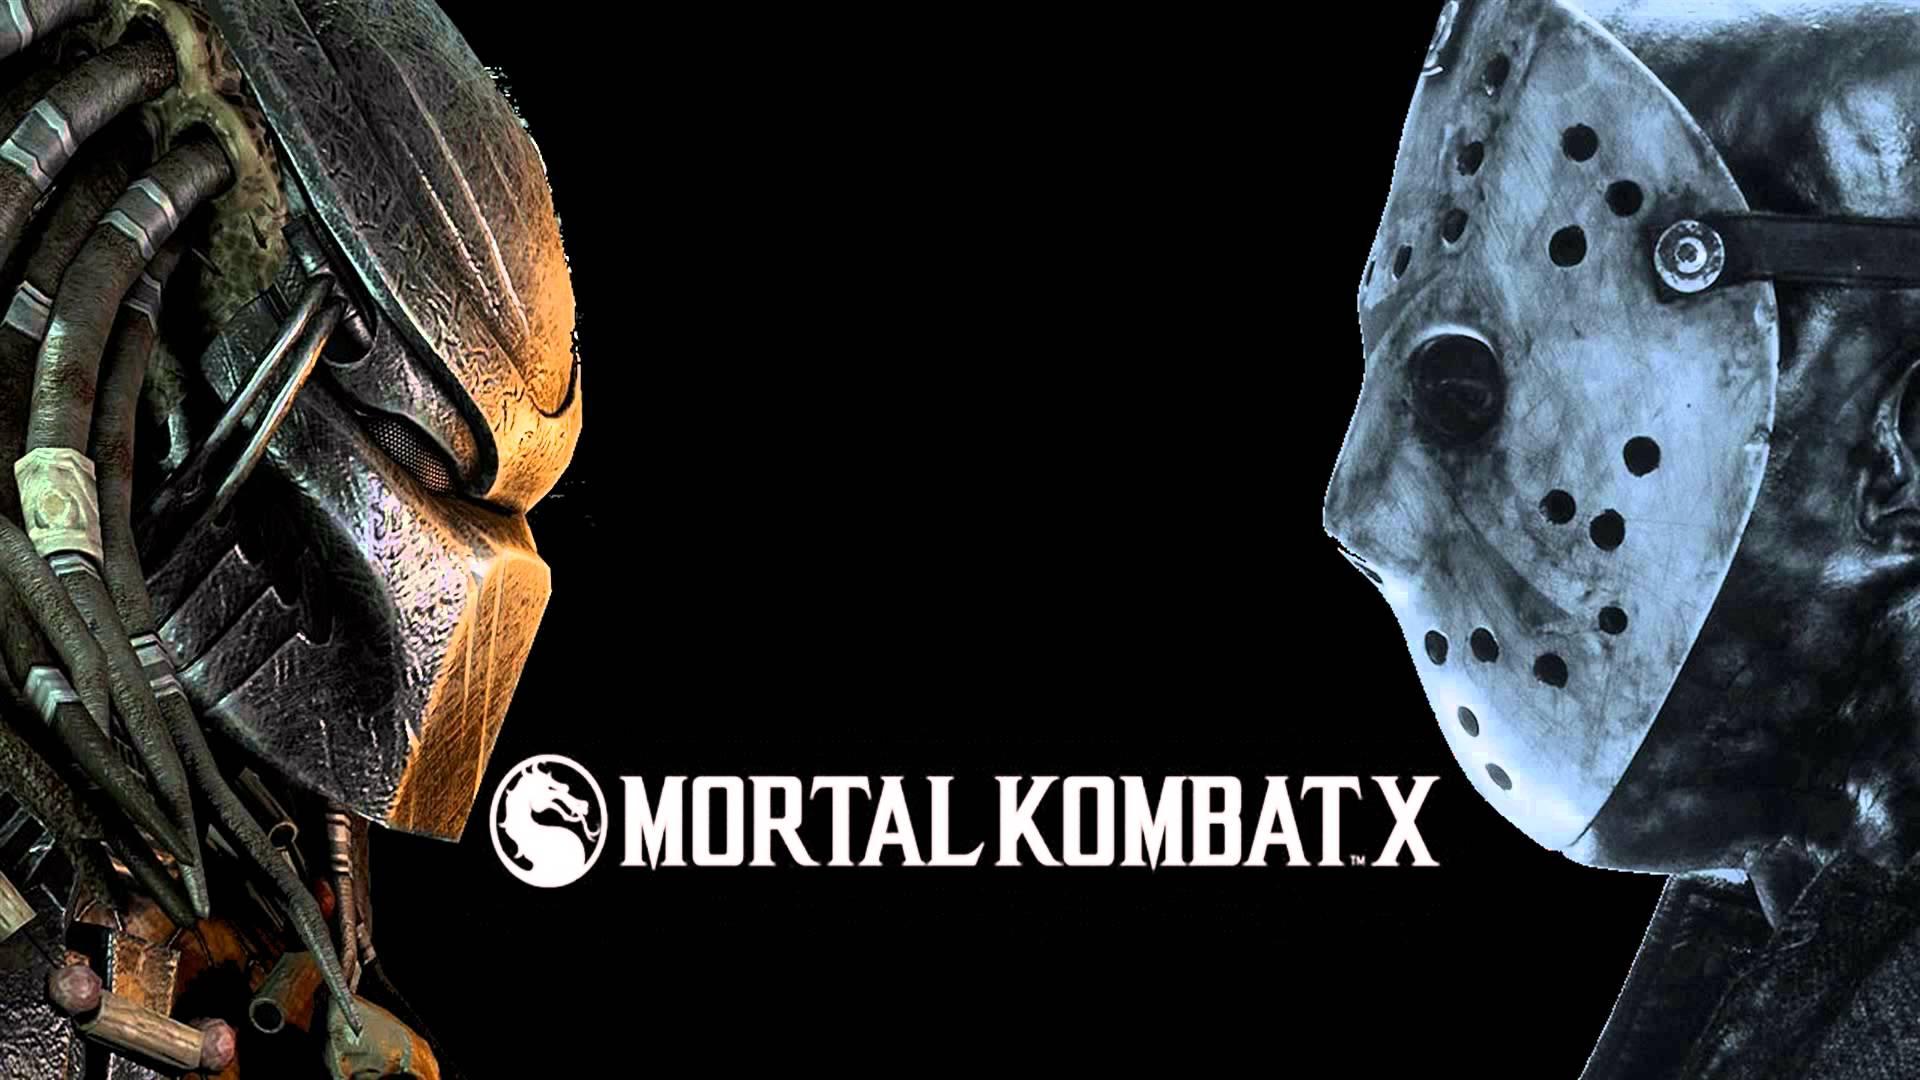 mortal kombat x new characters jason predator